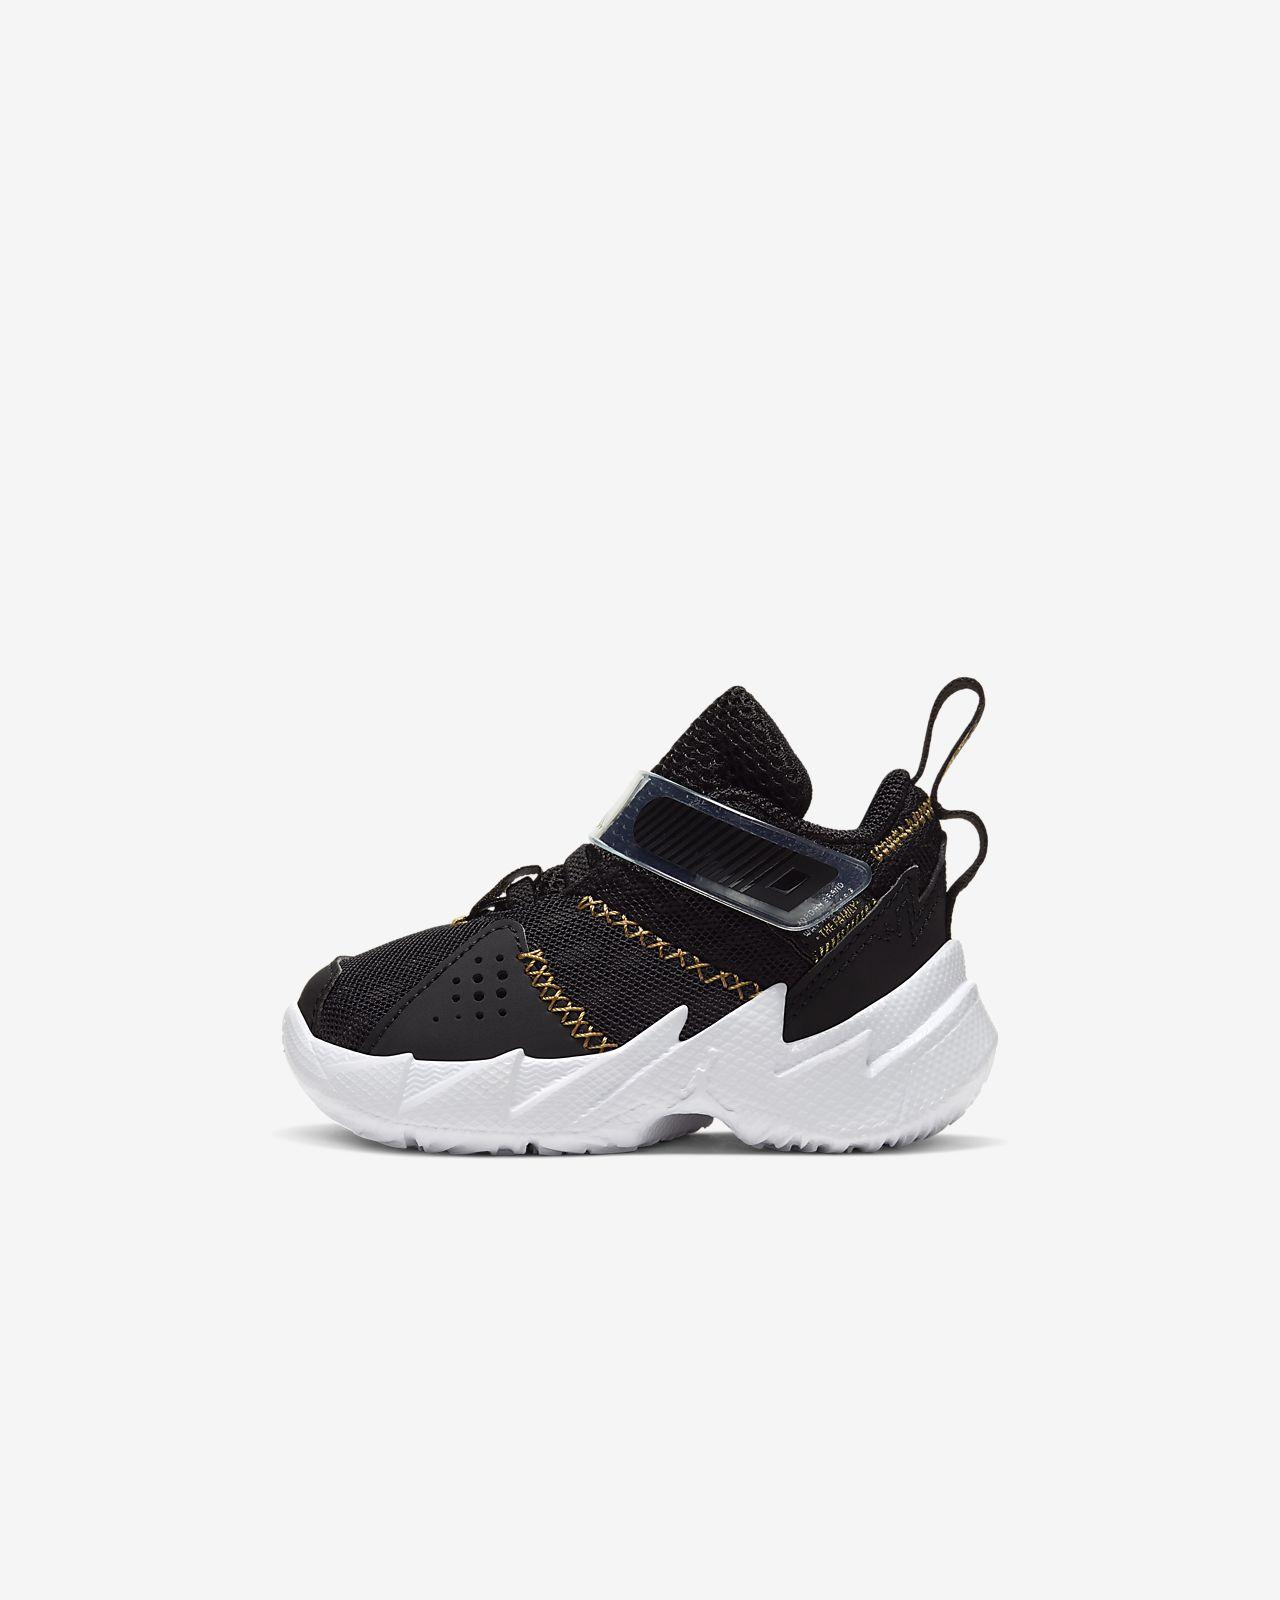 "Jordan ""Why Not?"" Zer0.3 Toddler/Infants' Shoe"